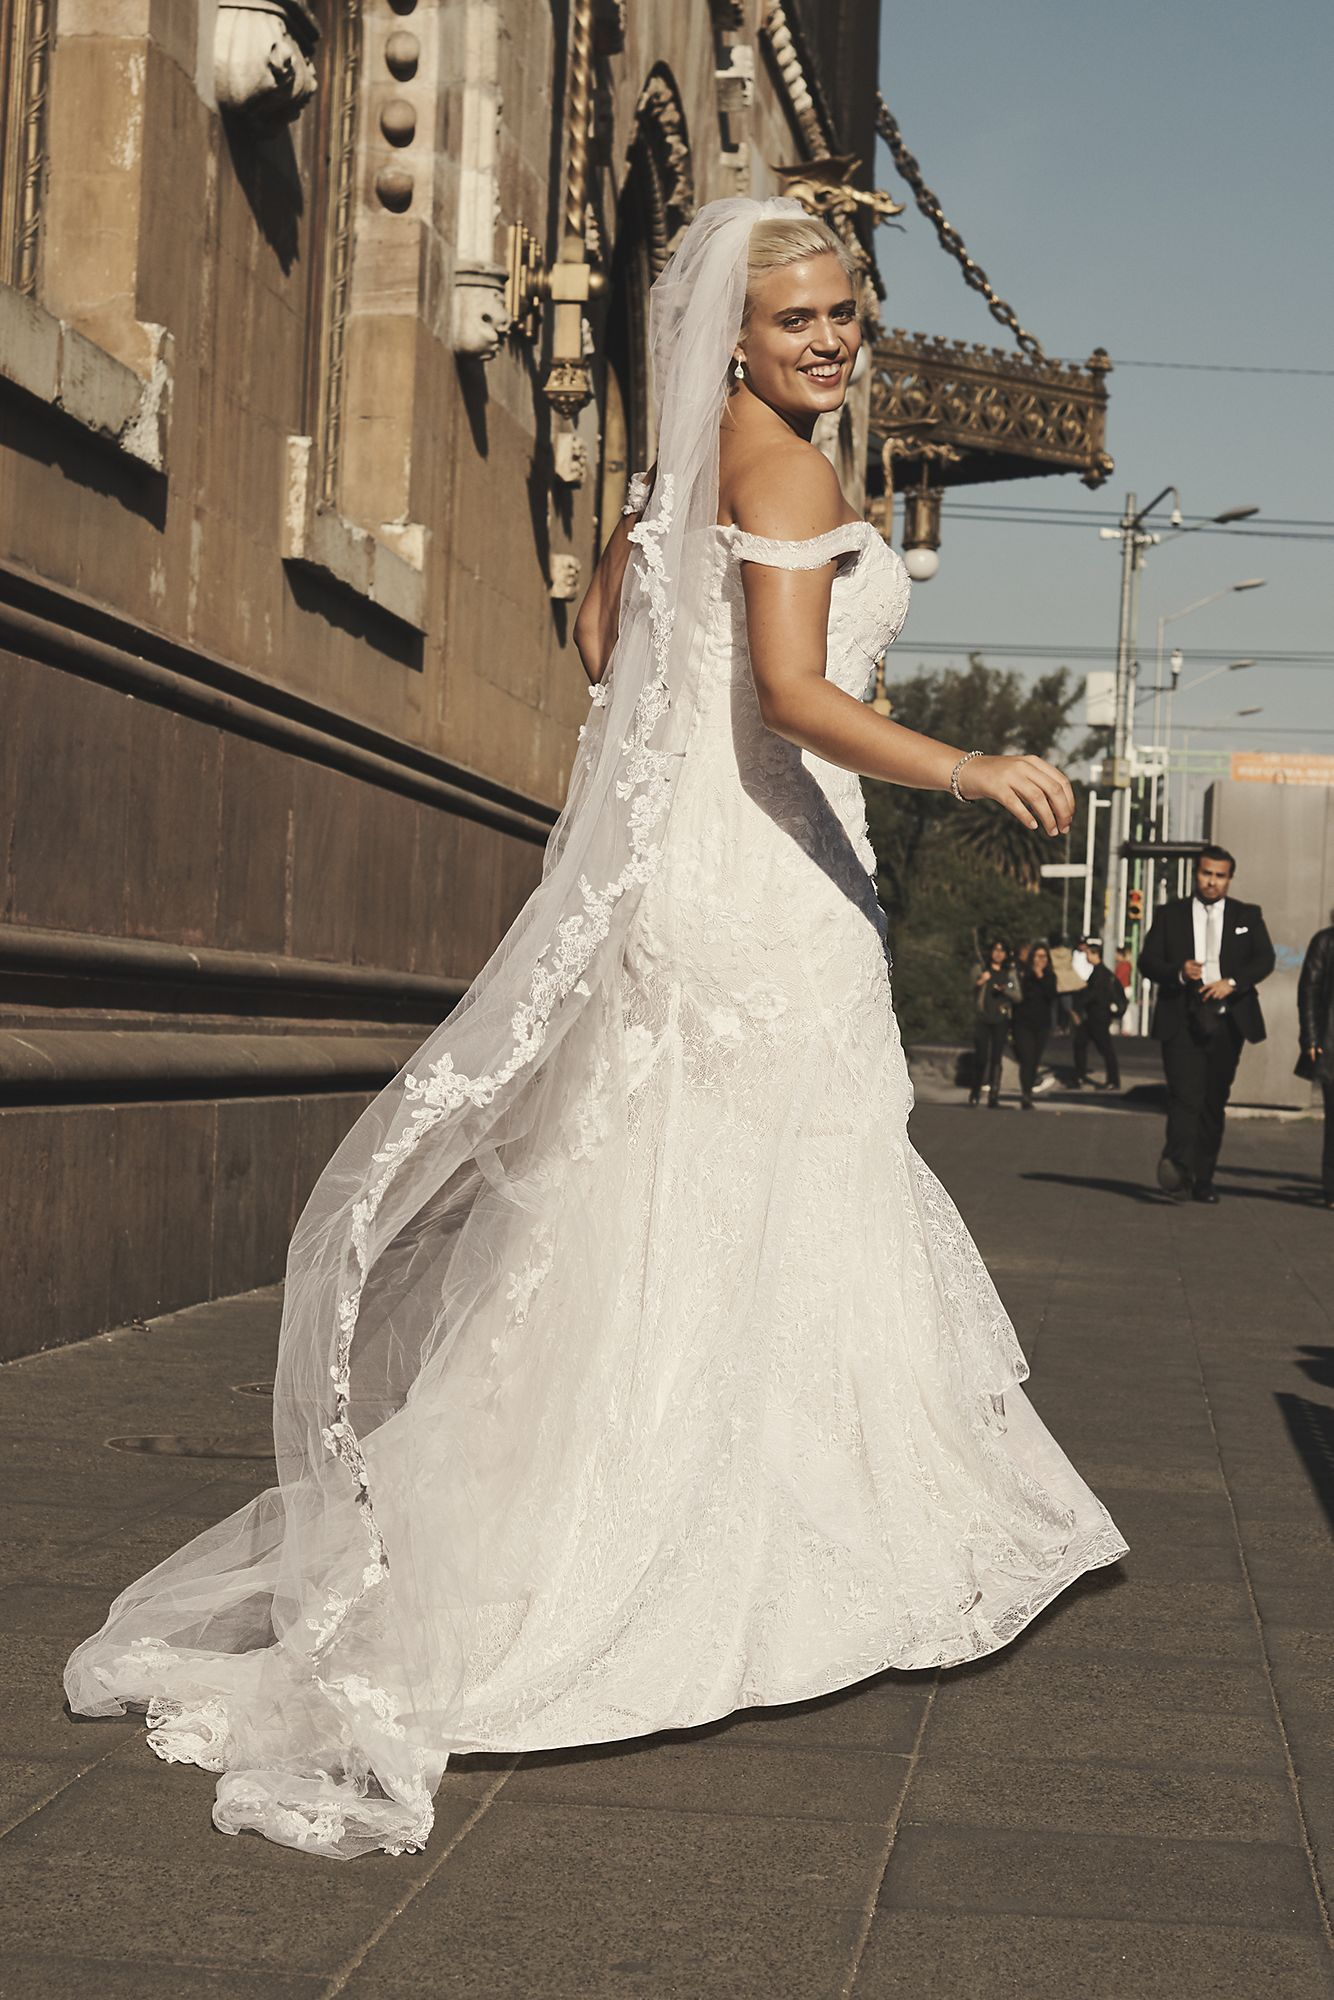 Layered Lace Swag Sleeve Plus Size Wedding Dress Melissa Sweet 4xl8ms251196 Davids Bridal Wedding Dresses Bridal Trumpet Wedding Dress [ 2000 x 1334 Pixel ]